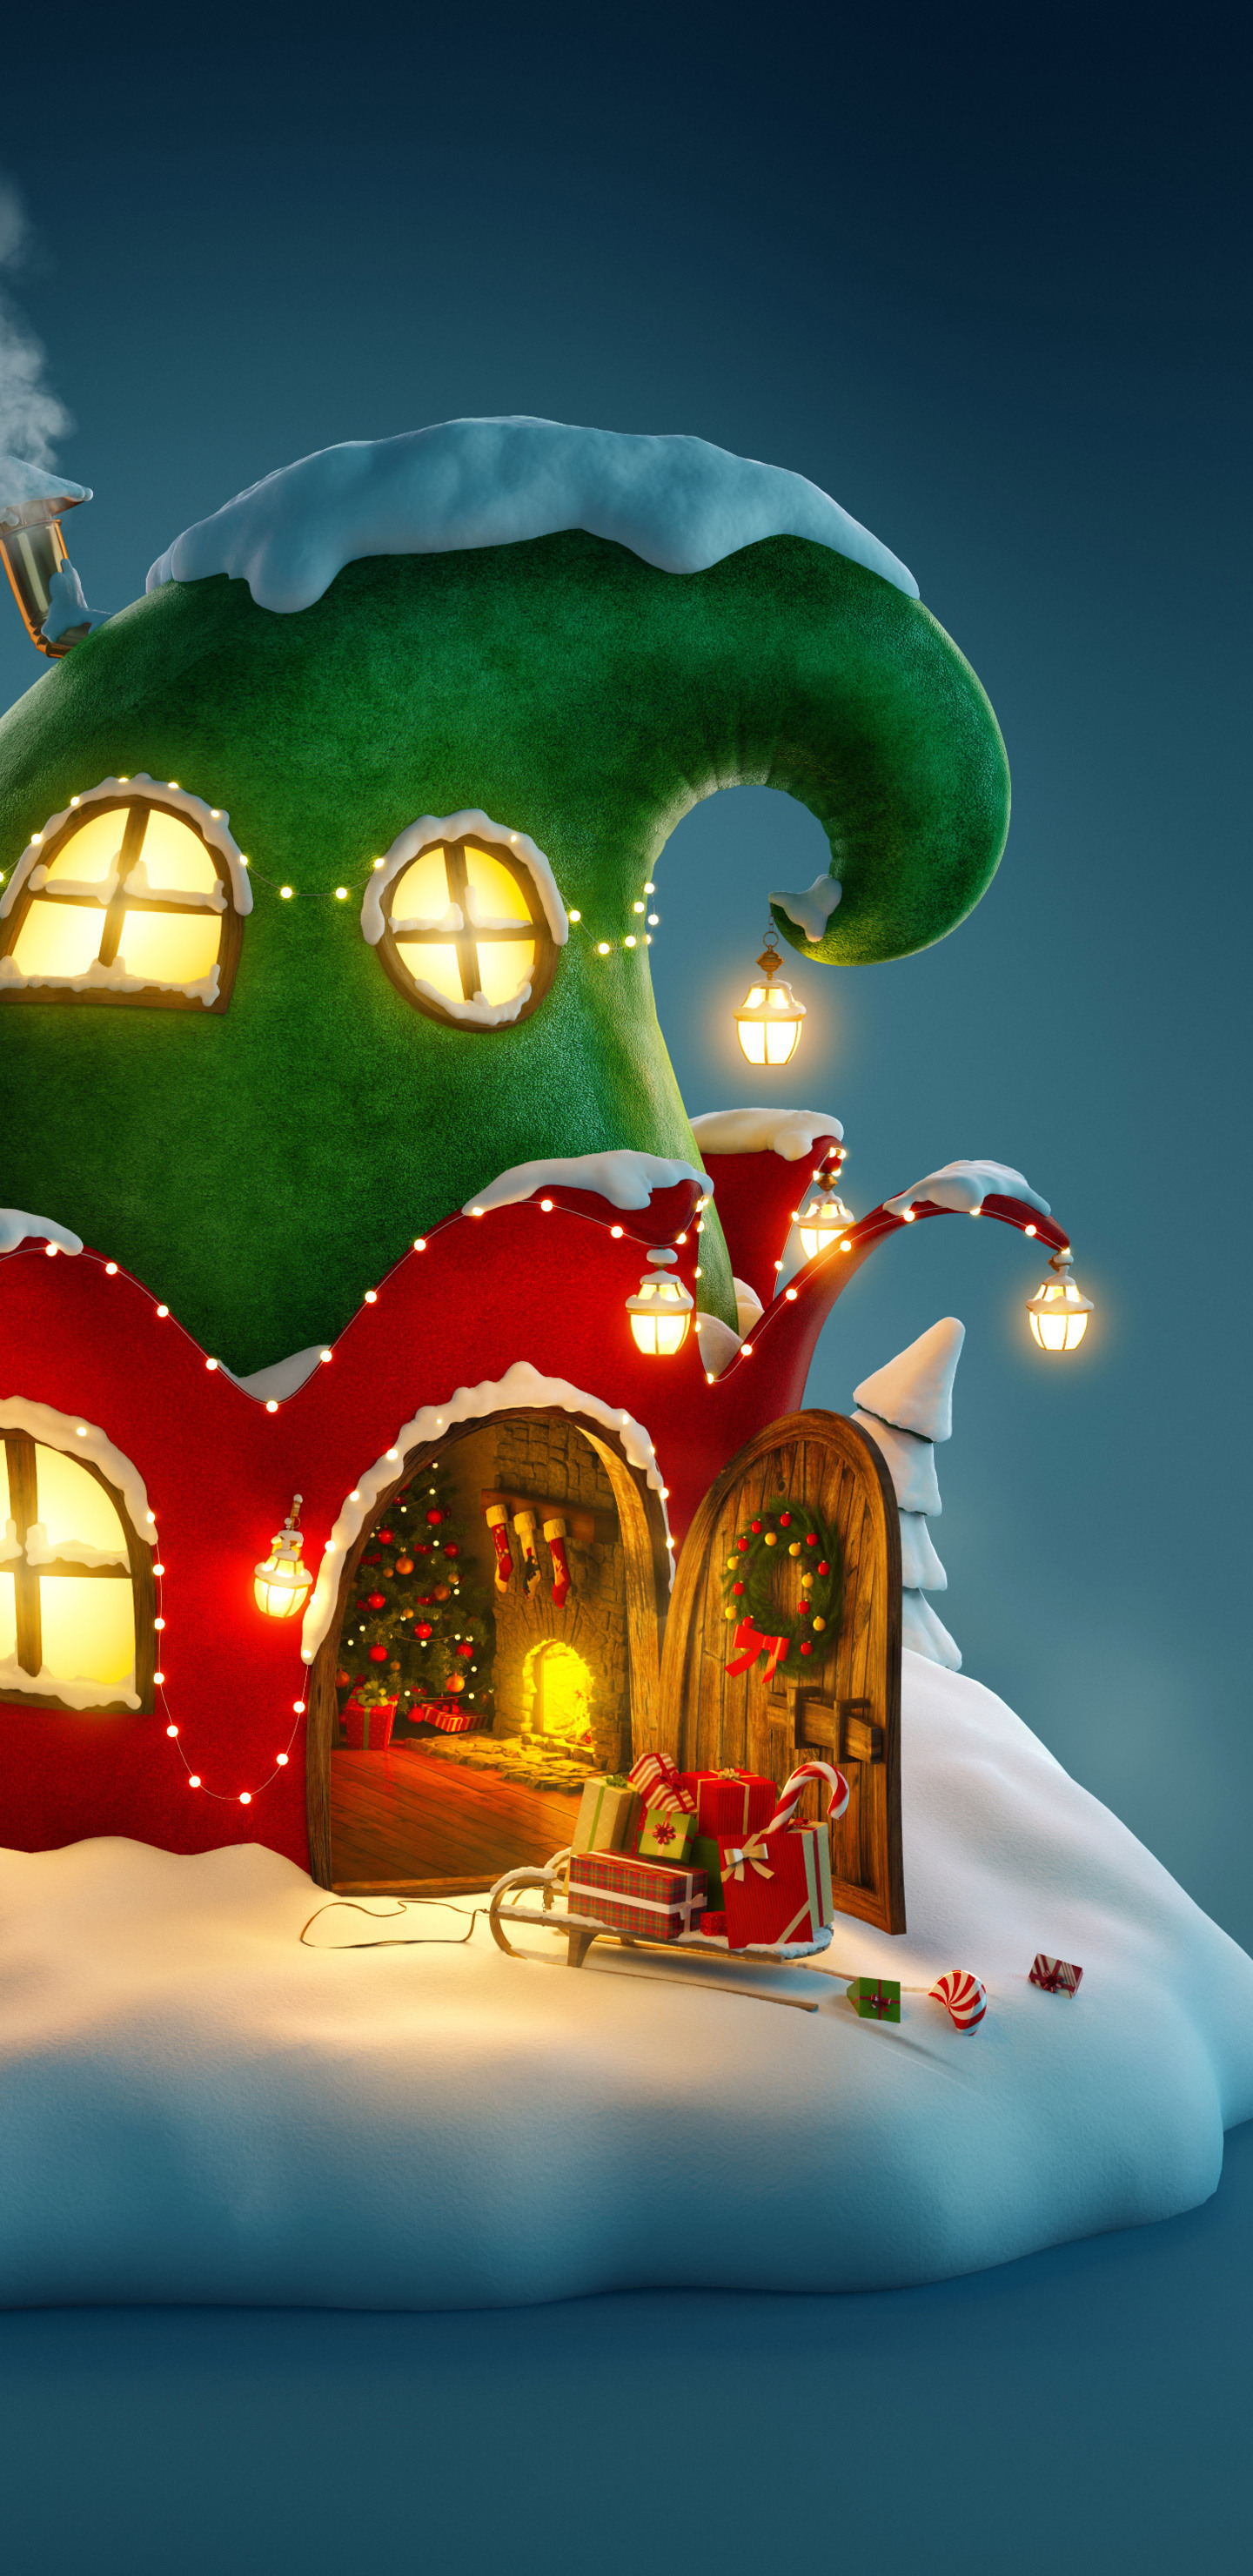 1440x2960 Christmas Fairy House 4k Samsung Galaxy Note 9 8 S9 S8